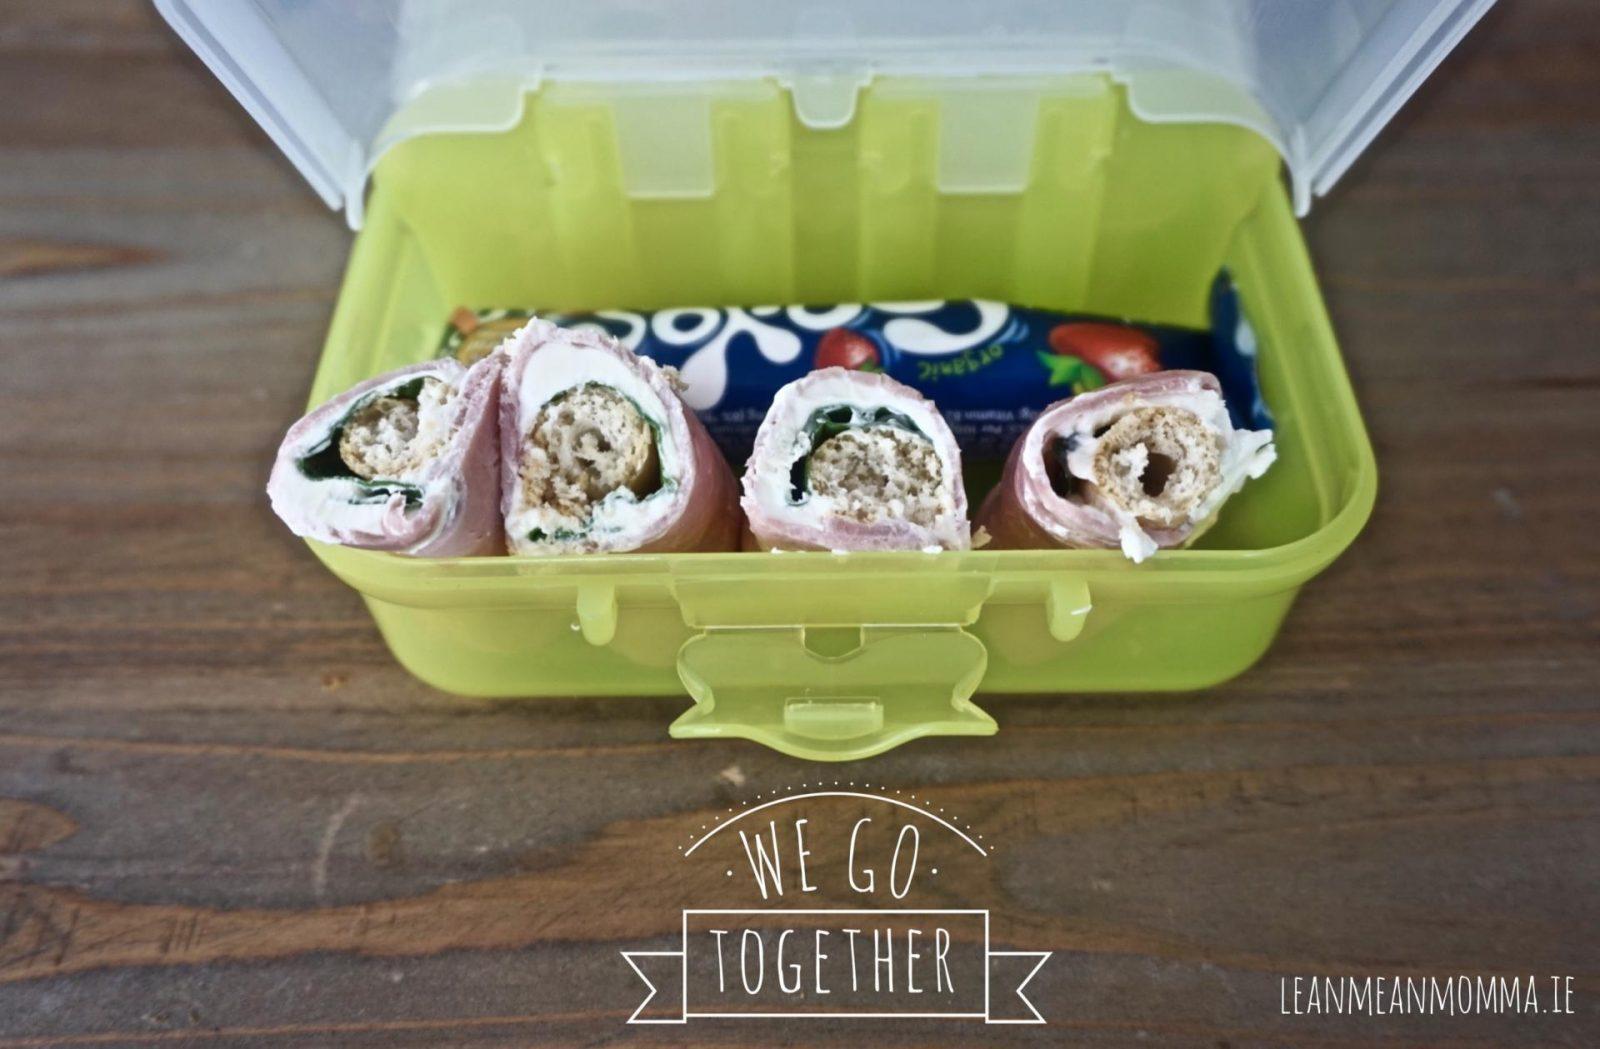 dunnes lunchbox leanmeanmomma